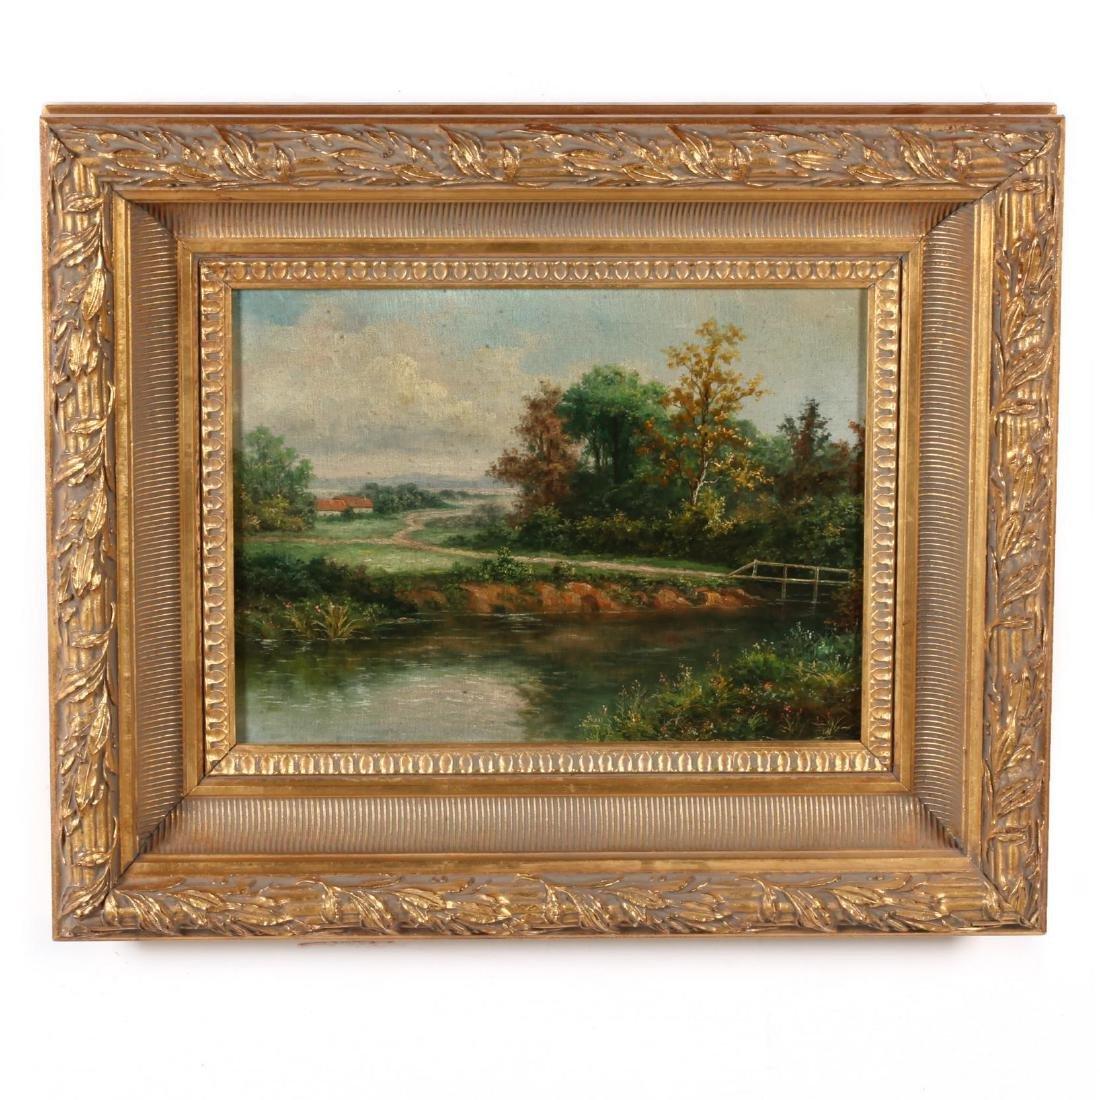 A Pair of Antique Style Decorative Landscape Paintings - 3